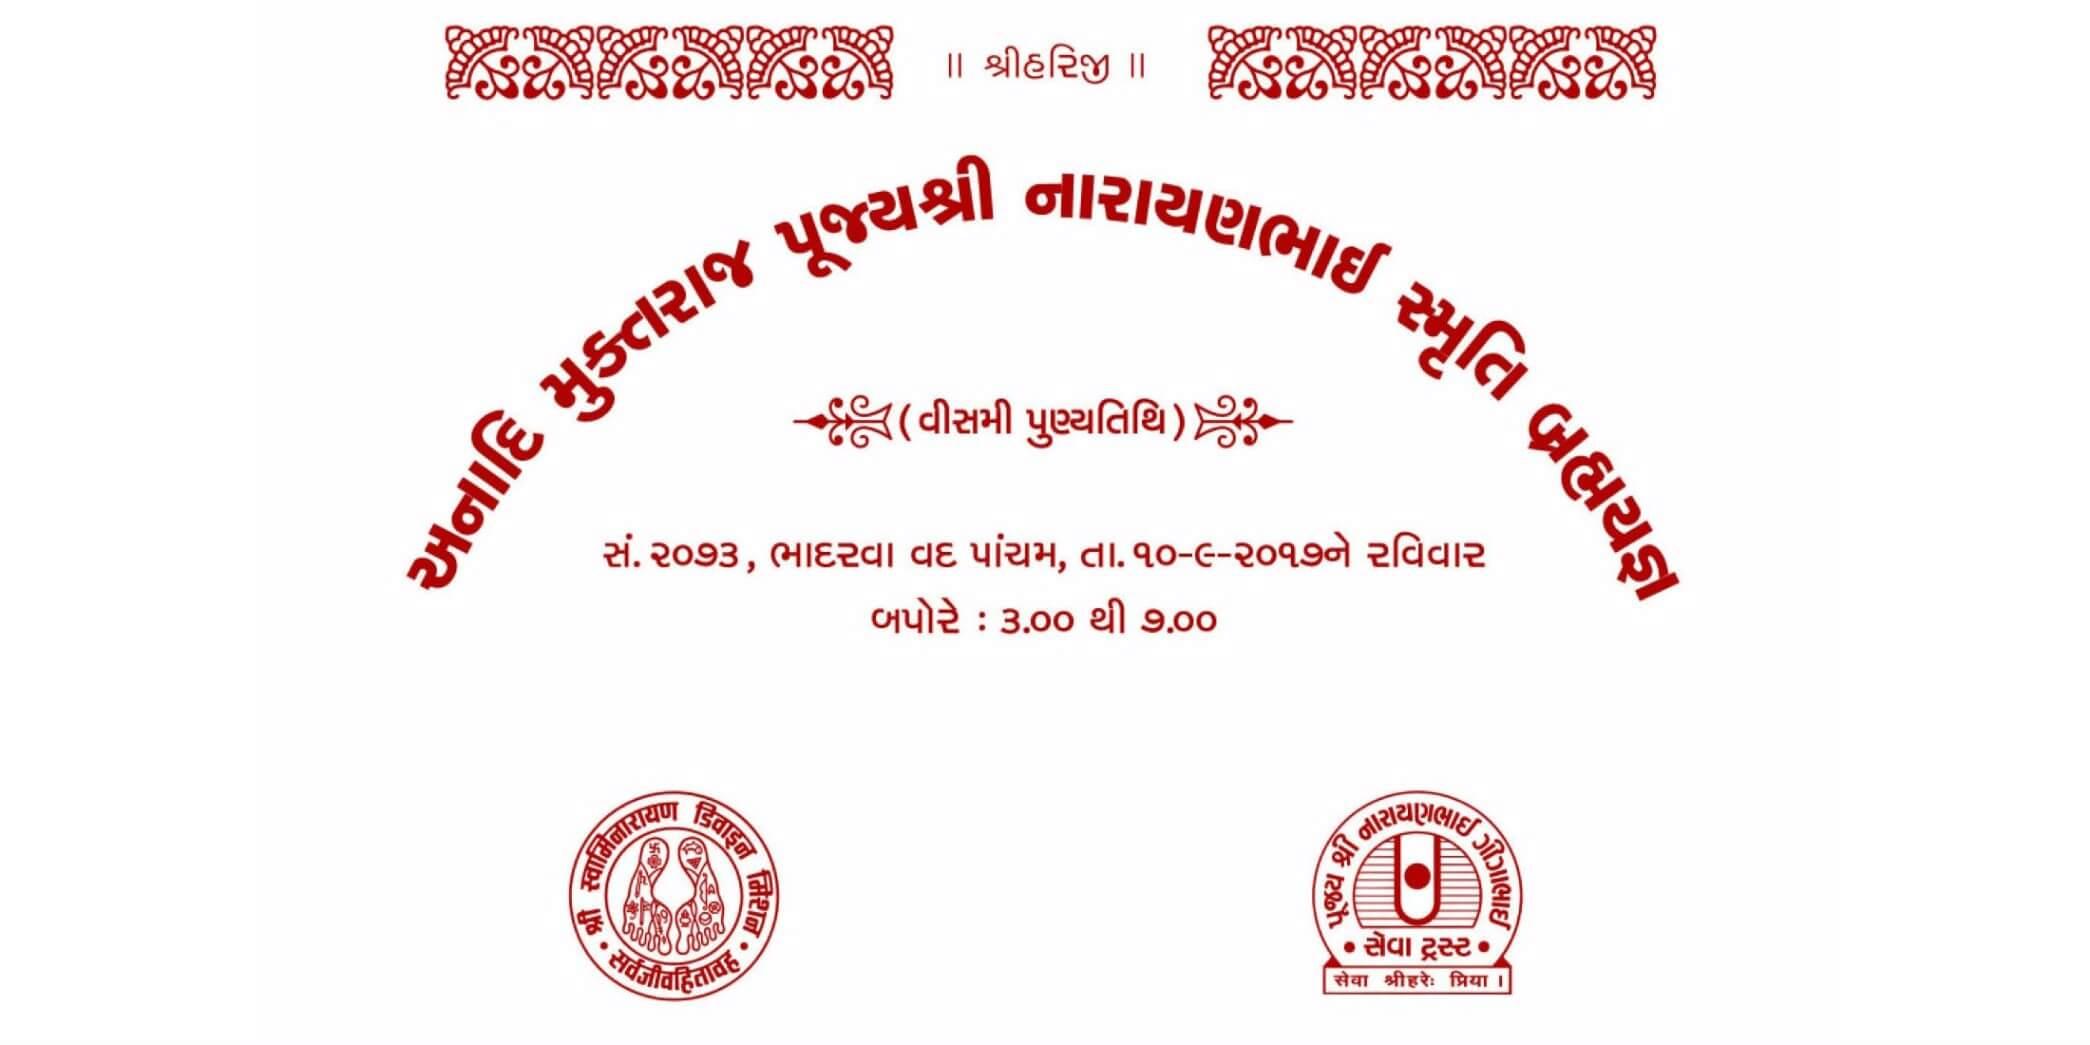 Watch Pujyashri Narayanbhai Smruti Brahmyagna Dt: 10/09/2017